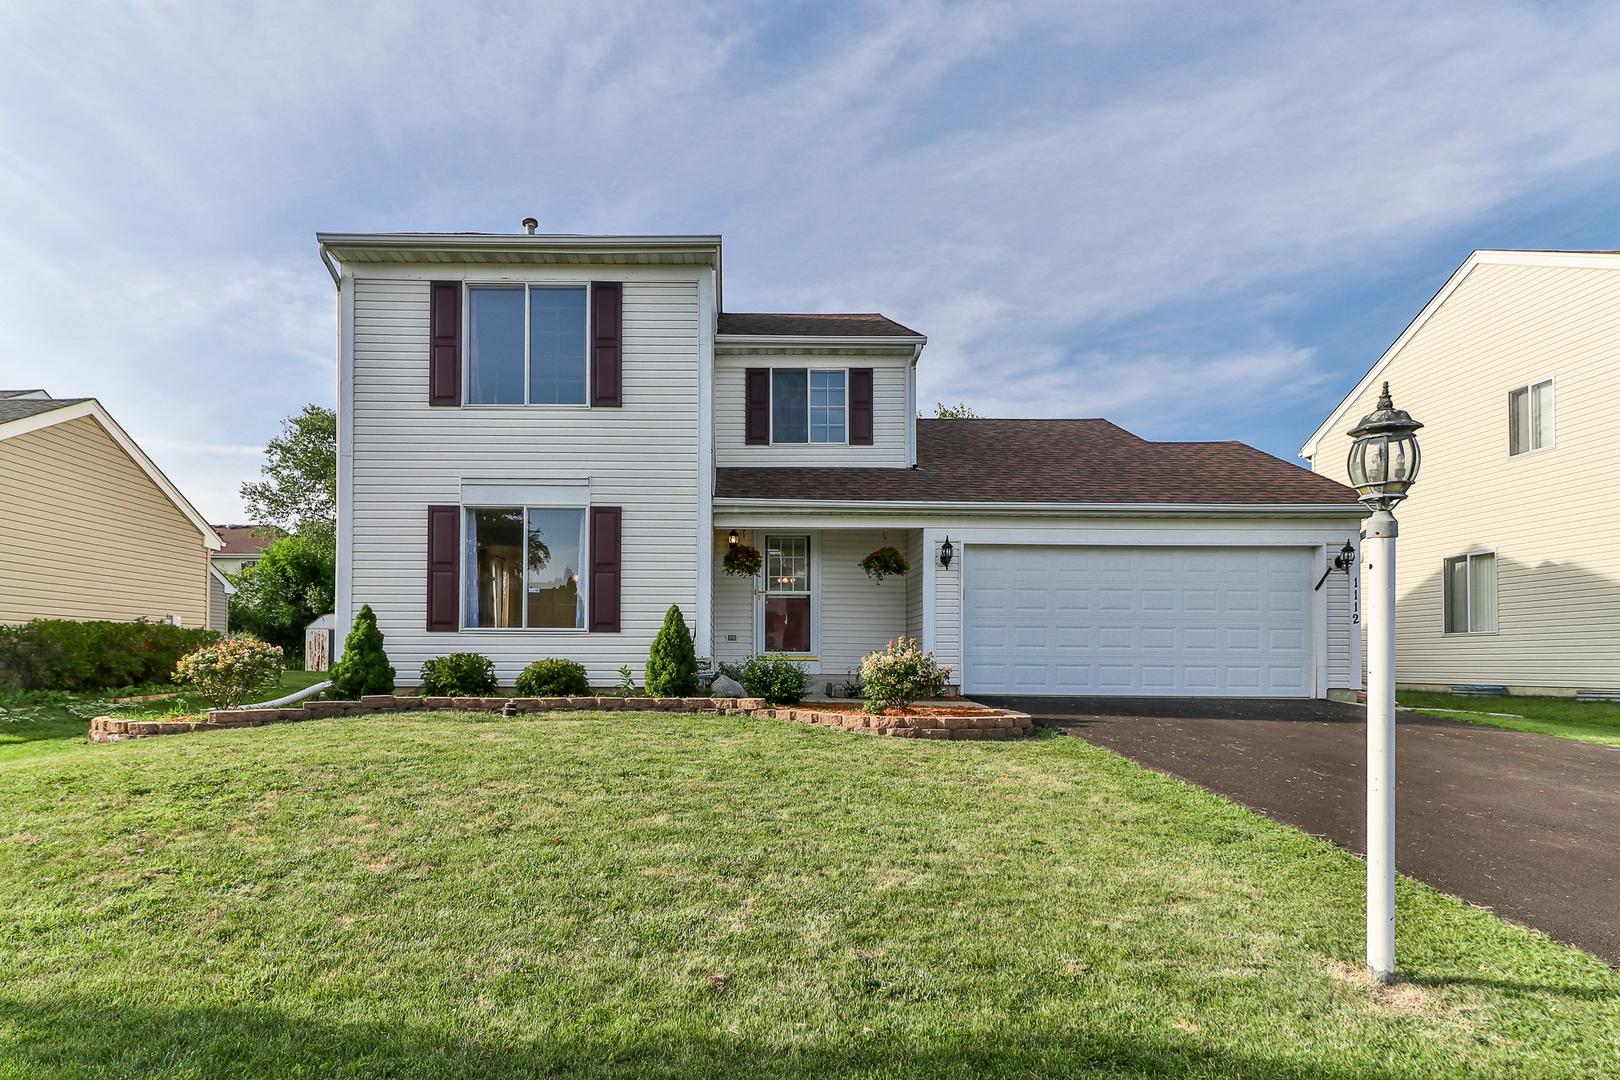 1112 Woodland Heights ,Streamwood, Illinois 60107